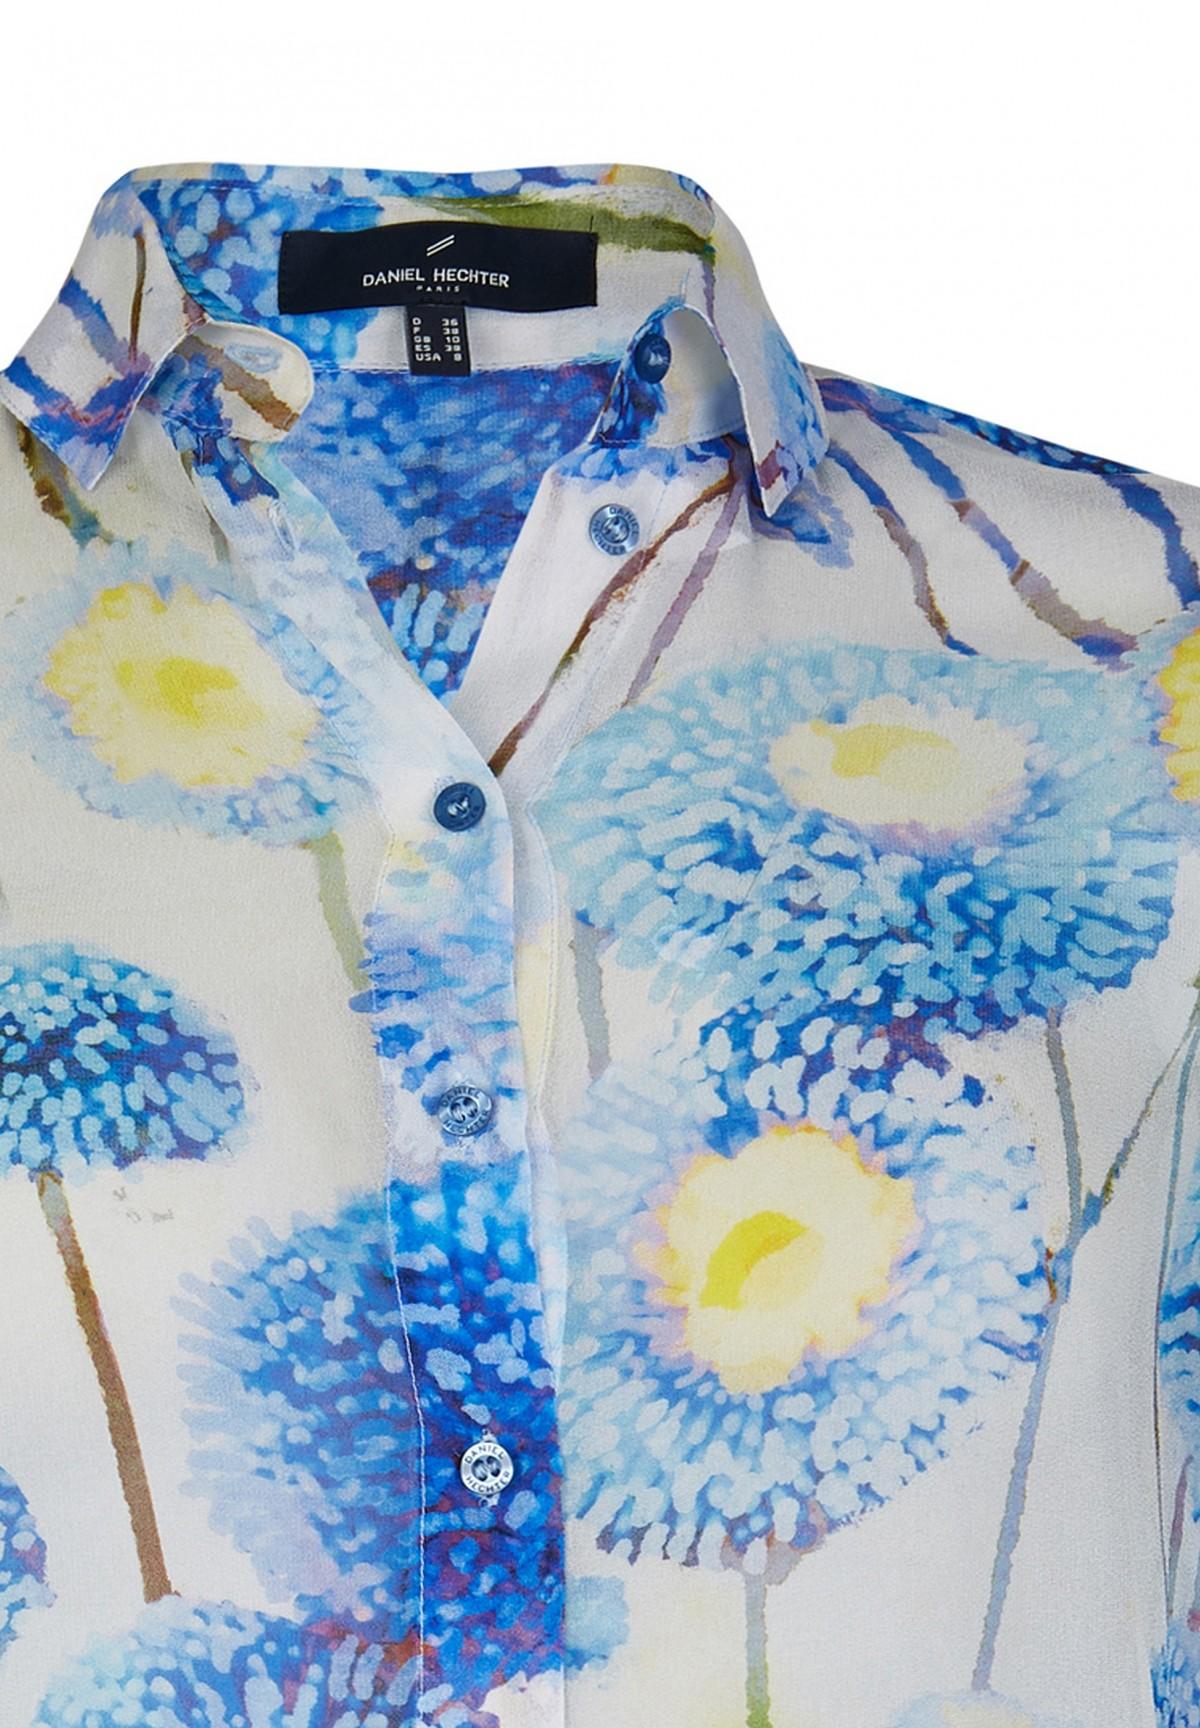 Modische Bluse mit floralem Druck / Blouse